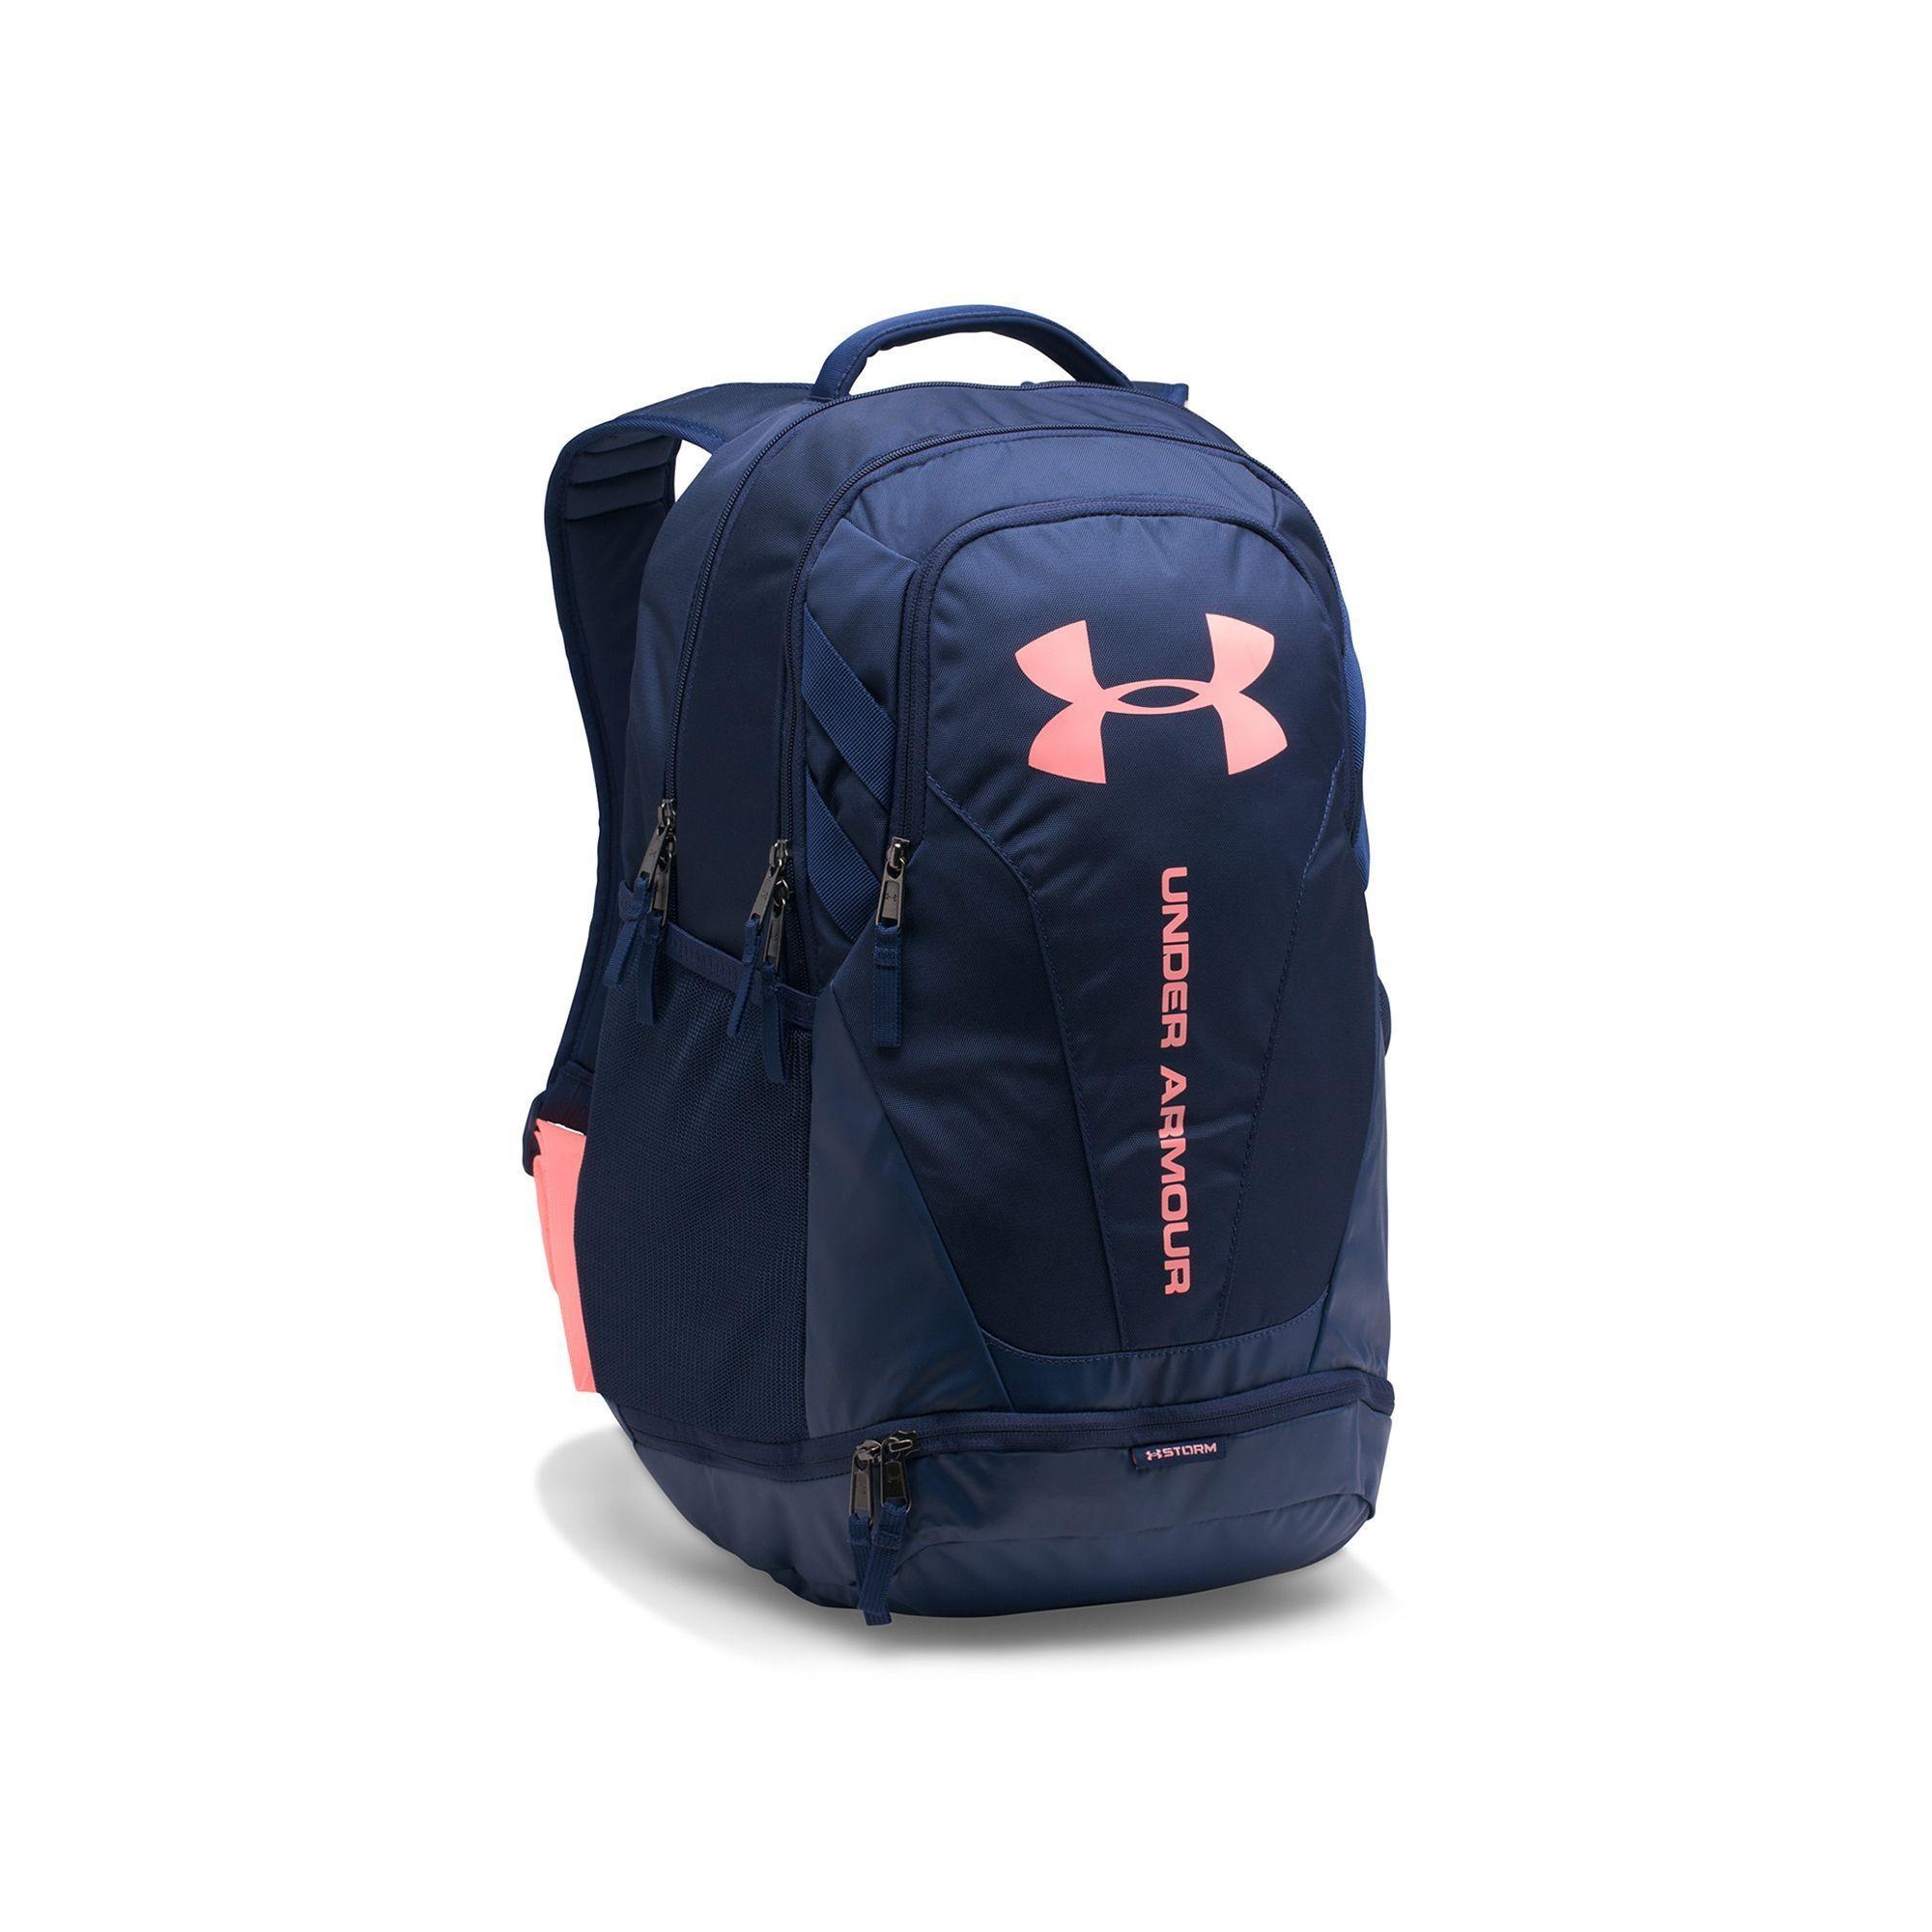 c20cc487a71e Under Armour Hustle 3.0 Laptop Backpack